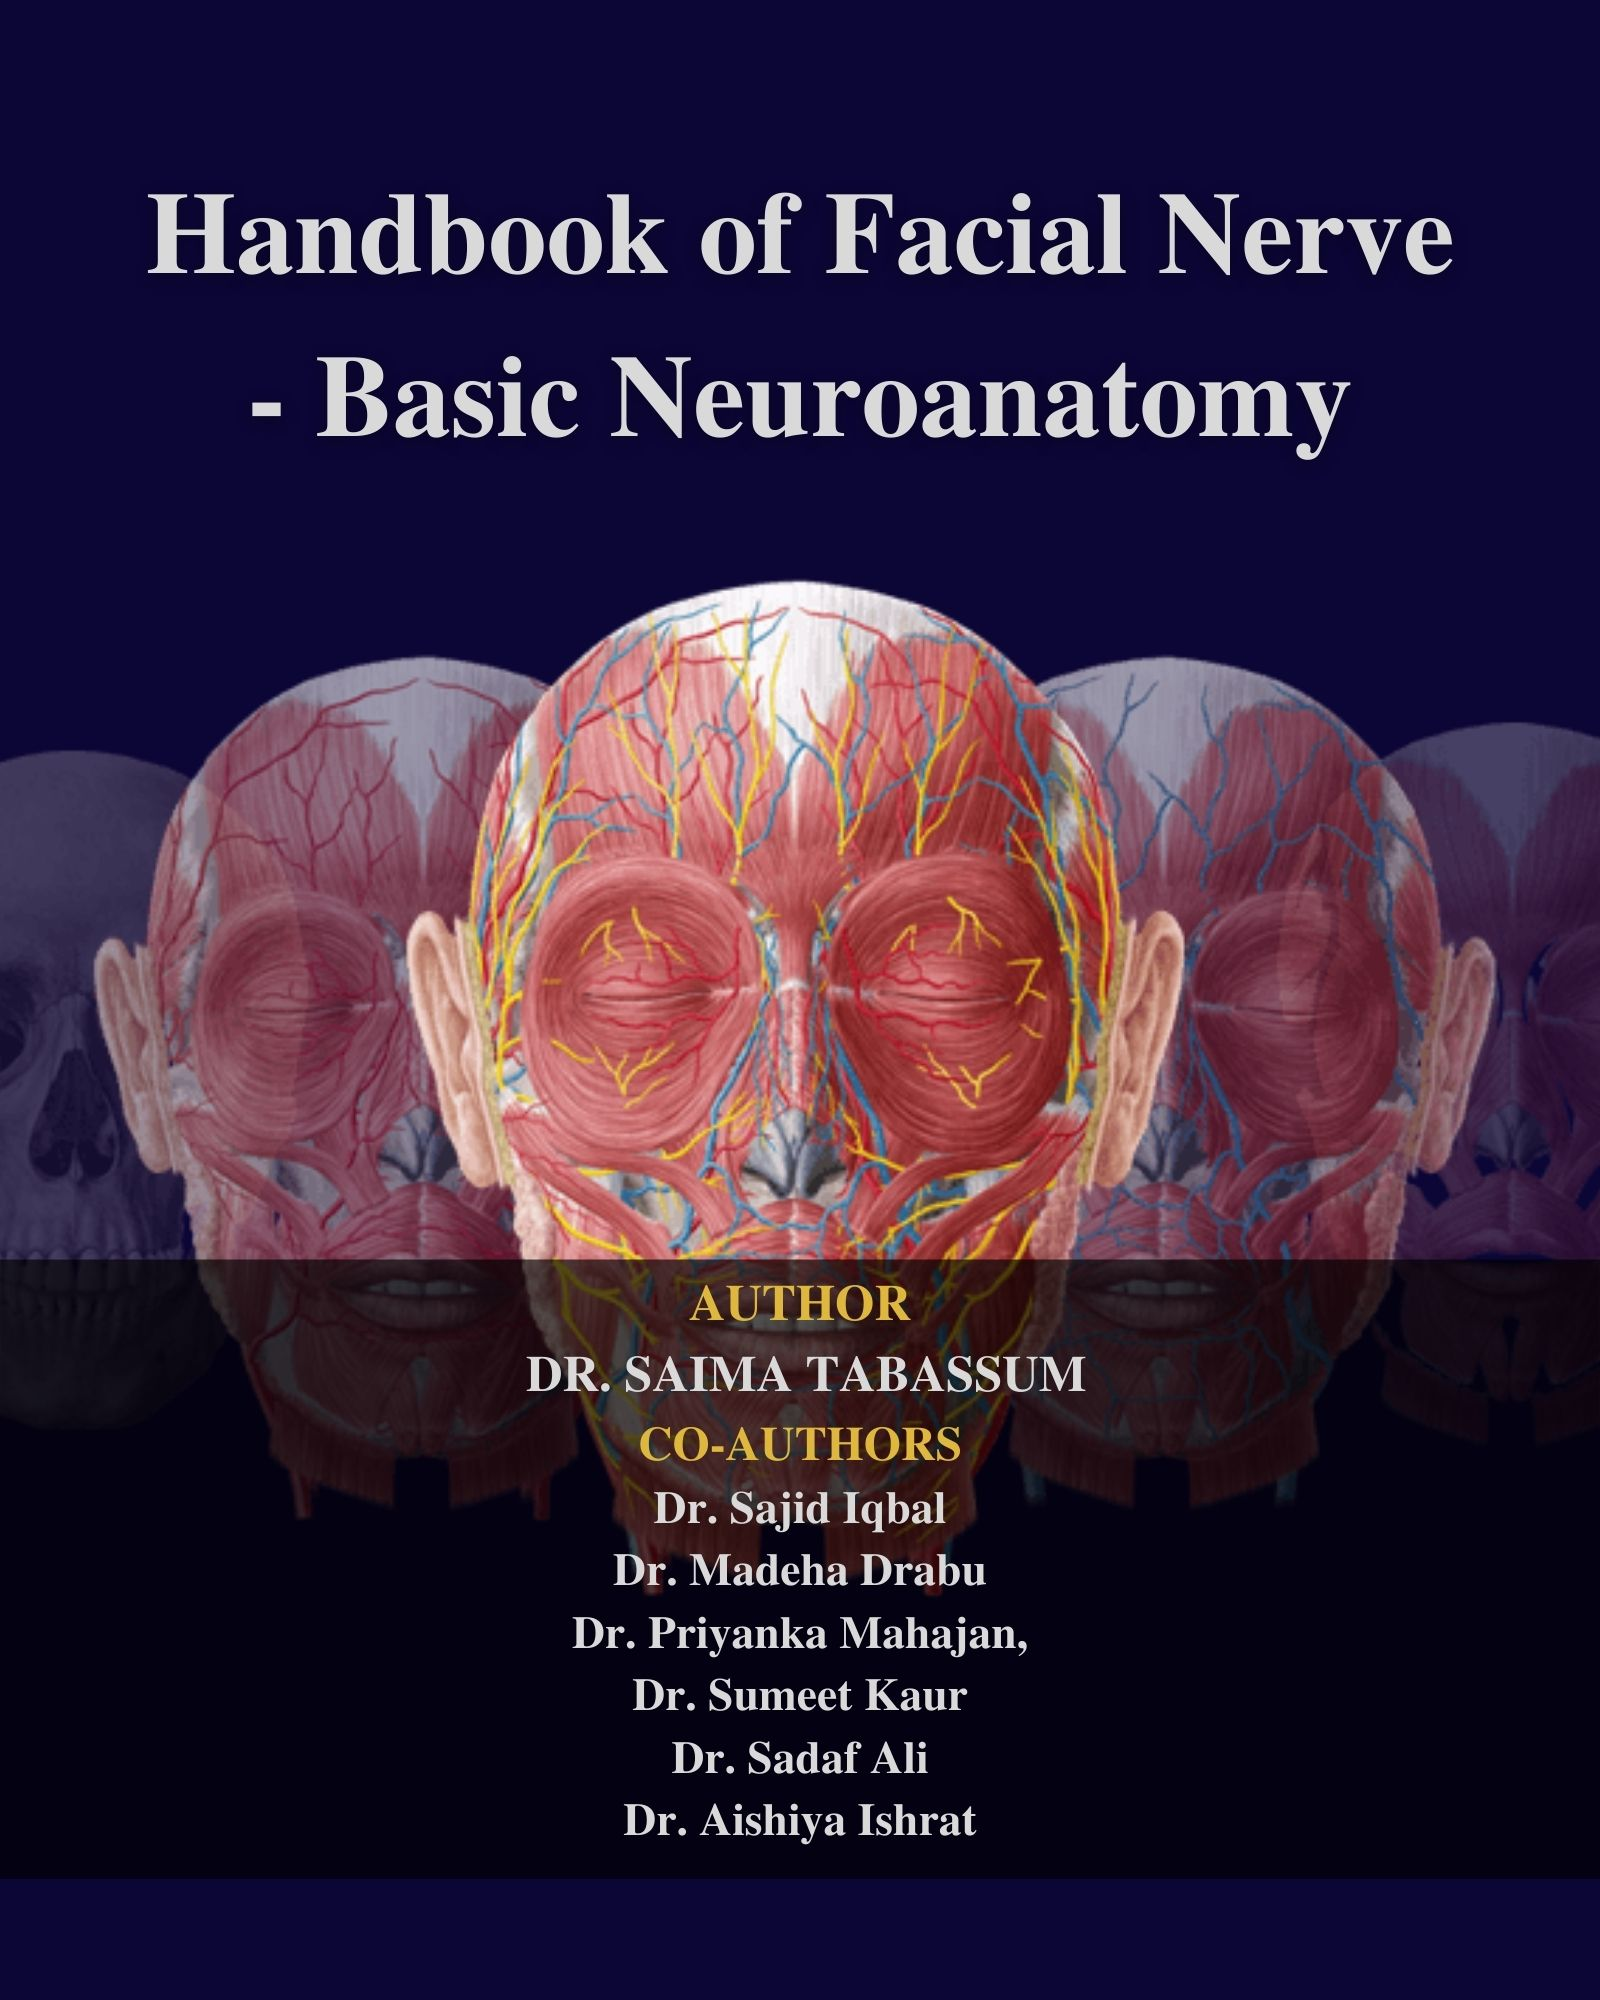 Handbook of Facial Nerve - Basic Neuroanatomy